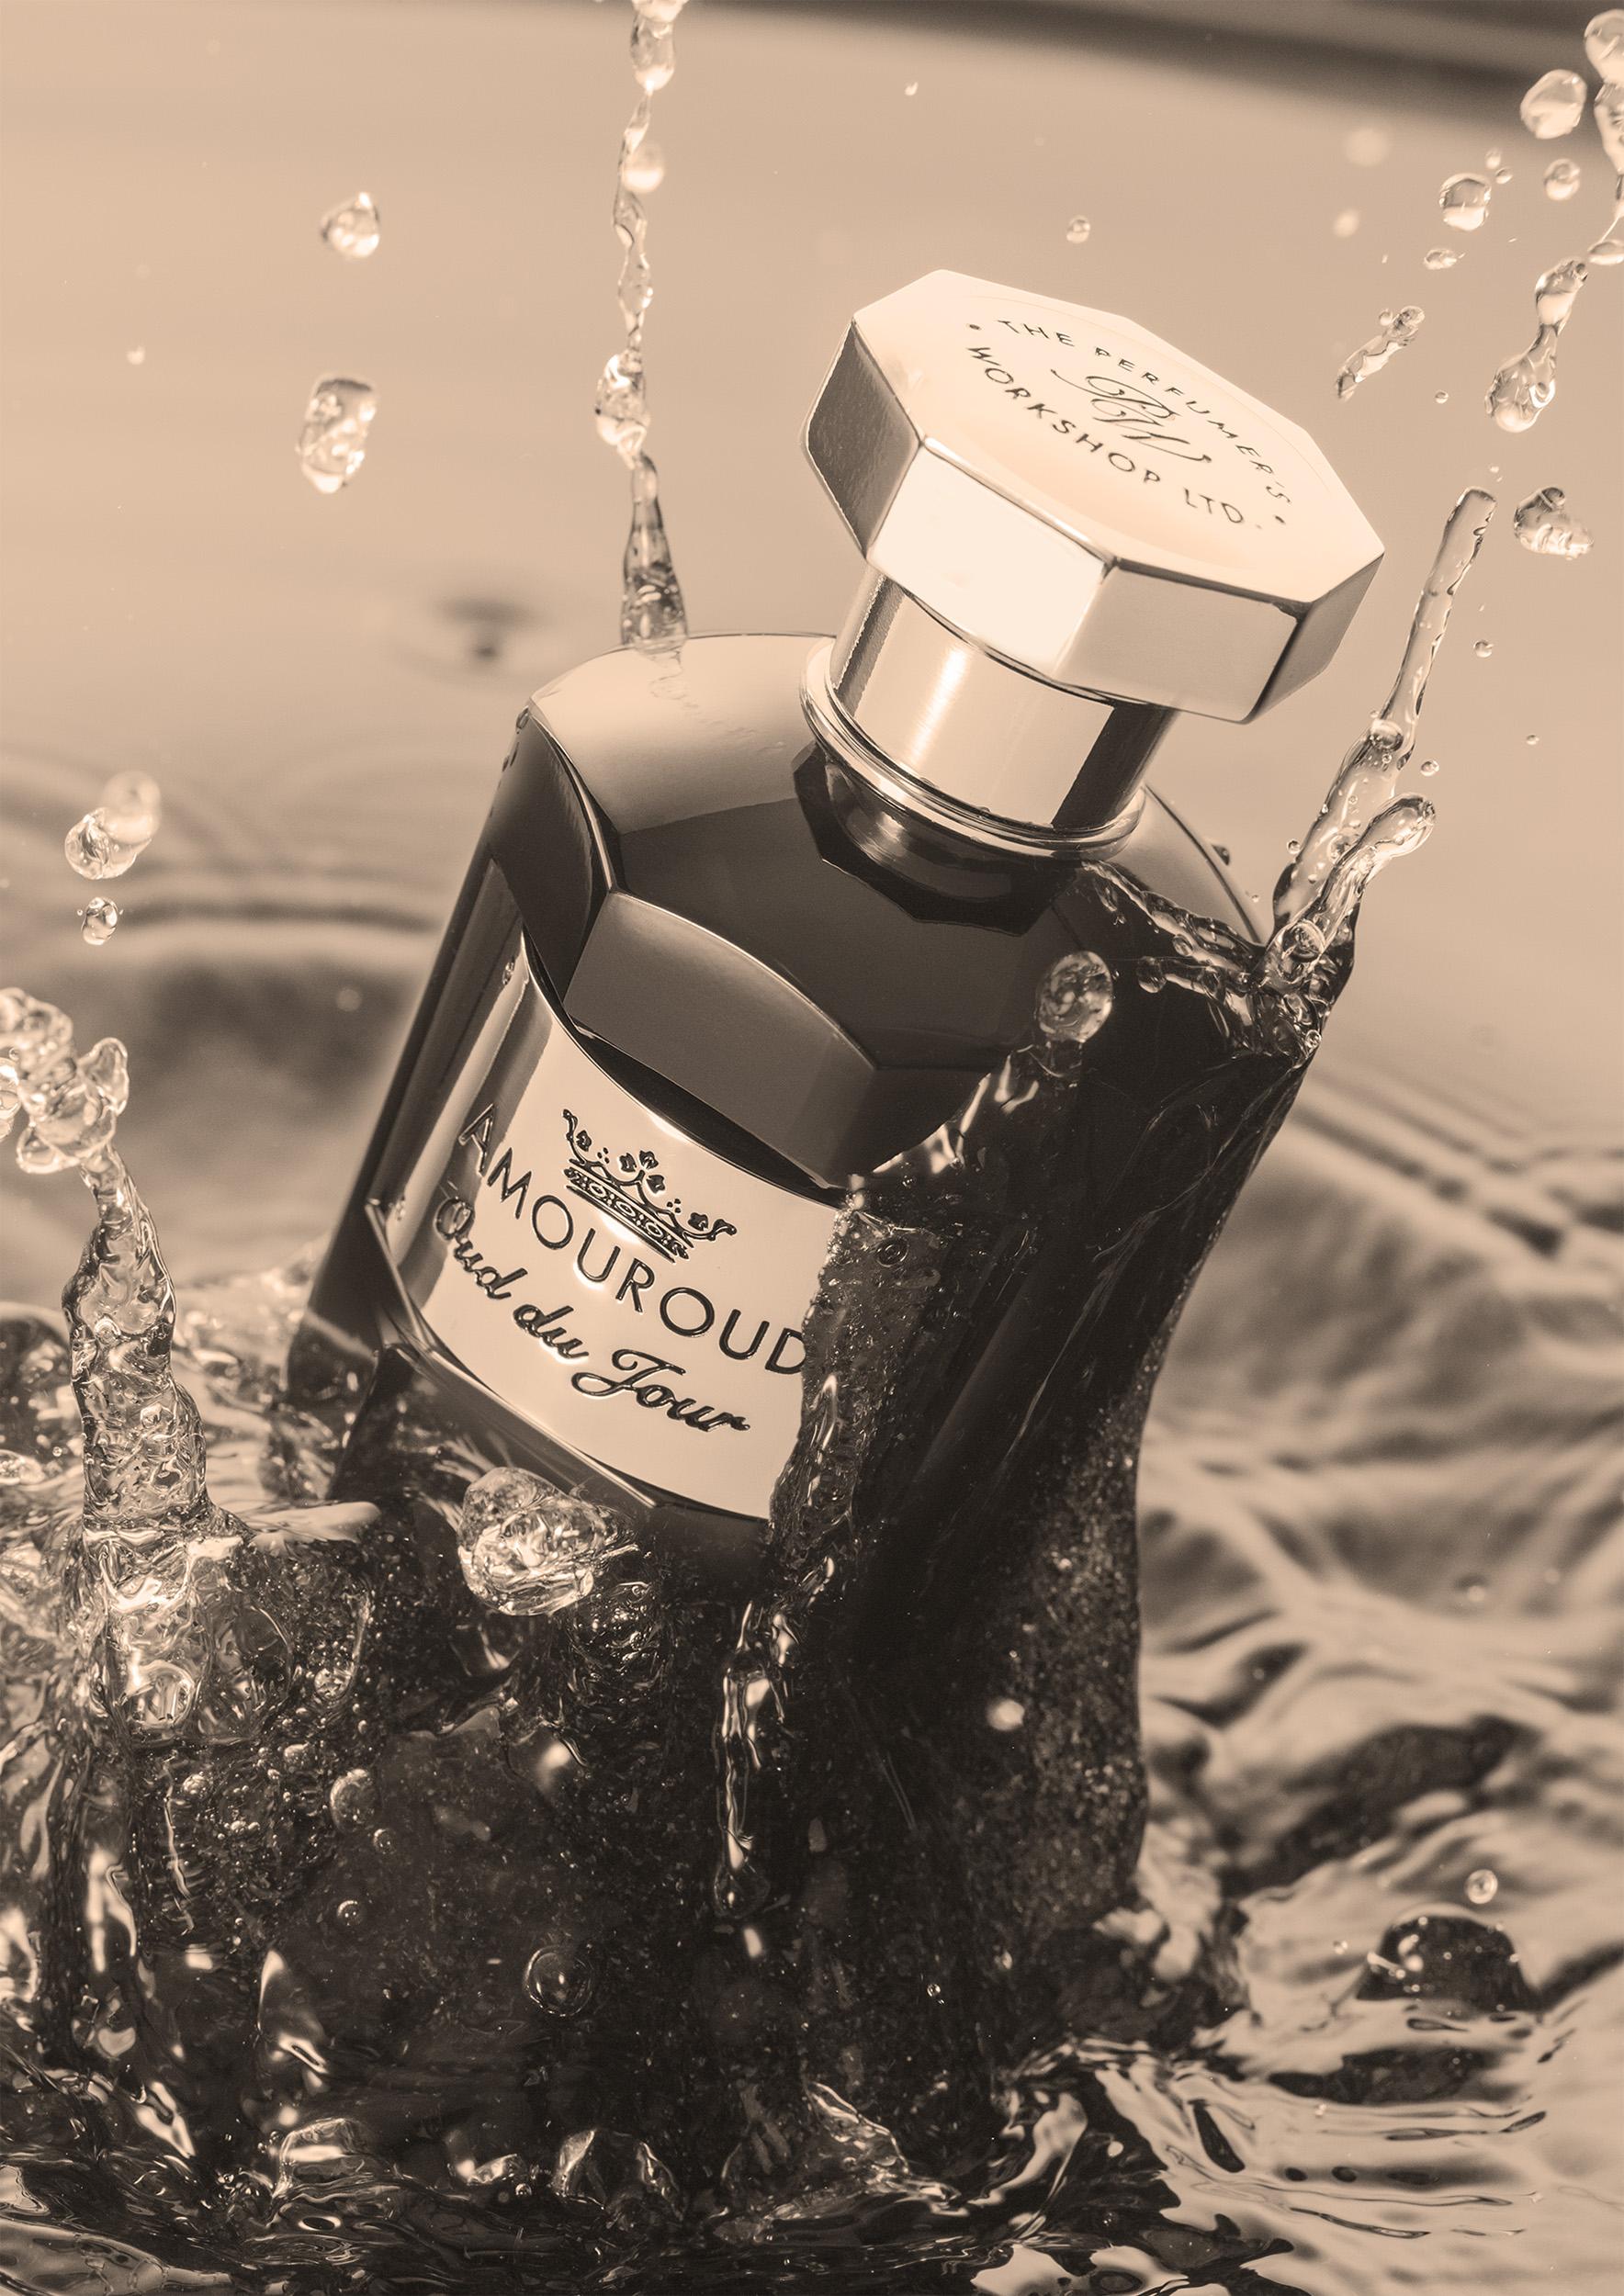 https://crisp.cc/wp-content/uploads/2019/09/Amouroud-parfum.jpg